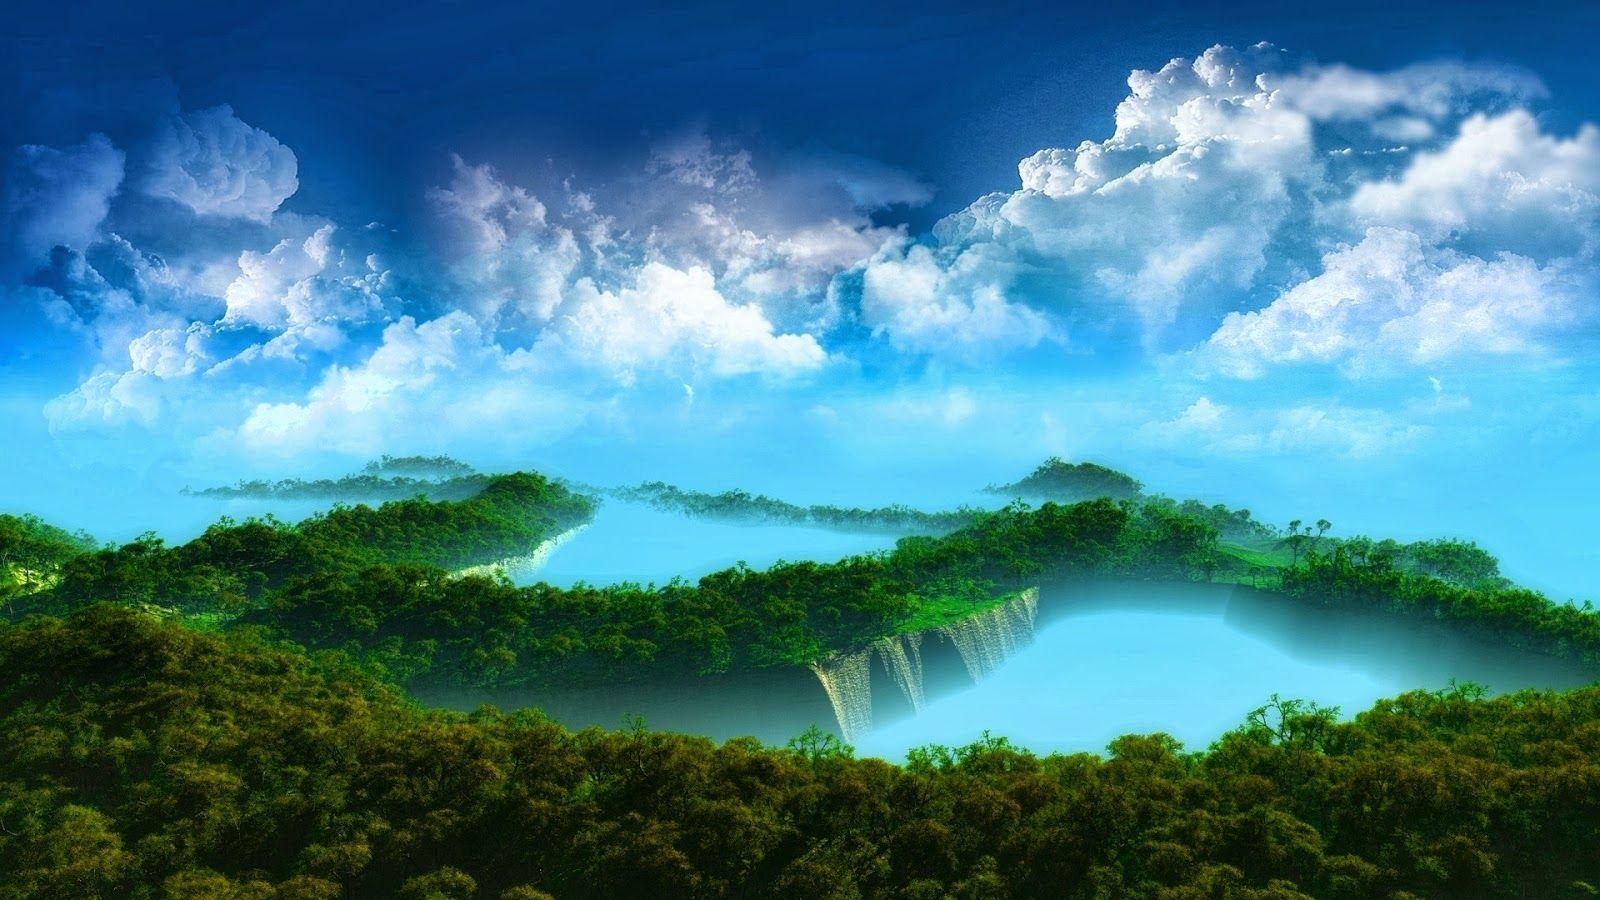 Hd Nature Wallpapers Pack Beautiful Nature Wallpaper Hd Hd Nature Wallpapers Beautiful Nature Wallpaper